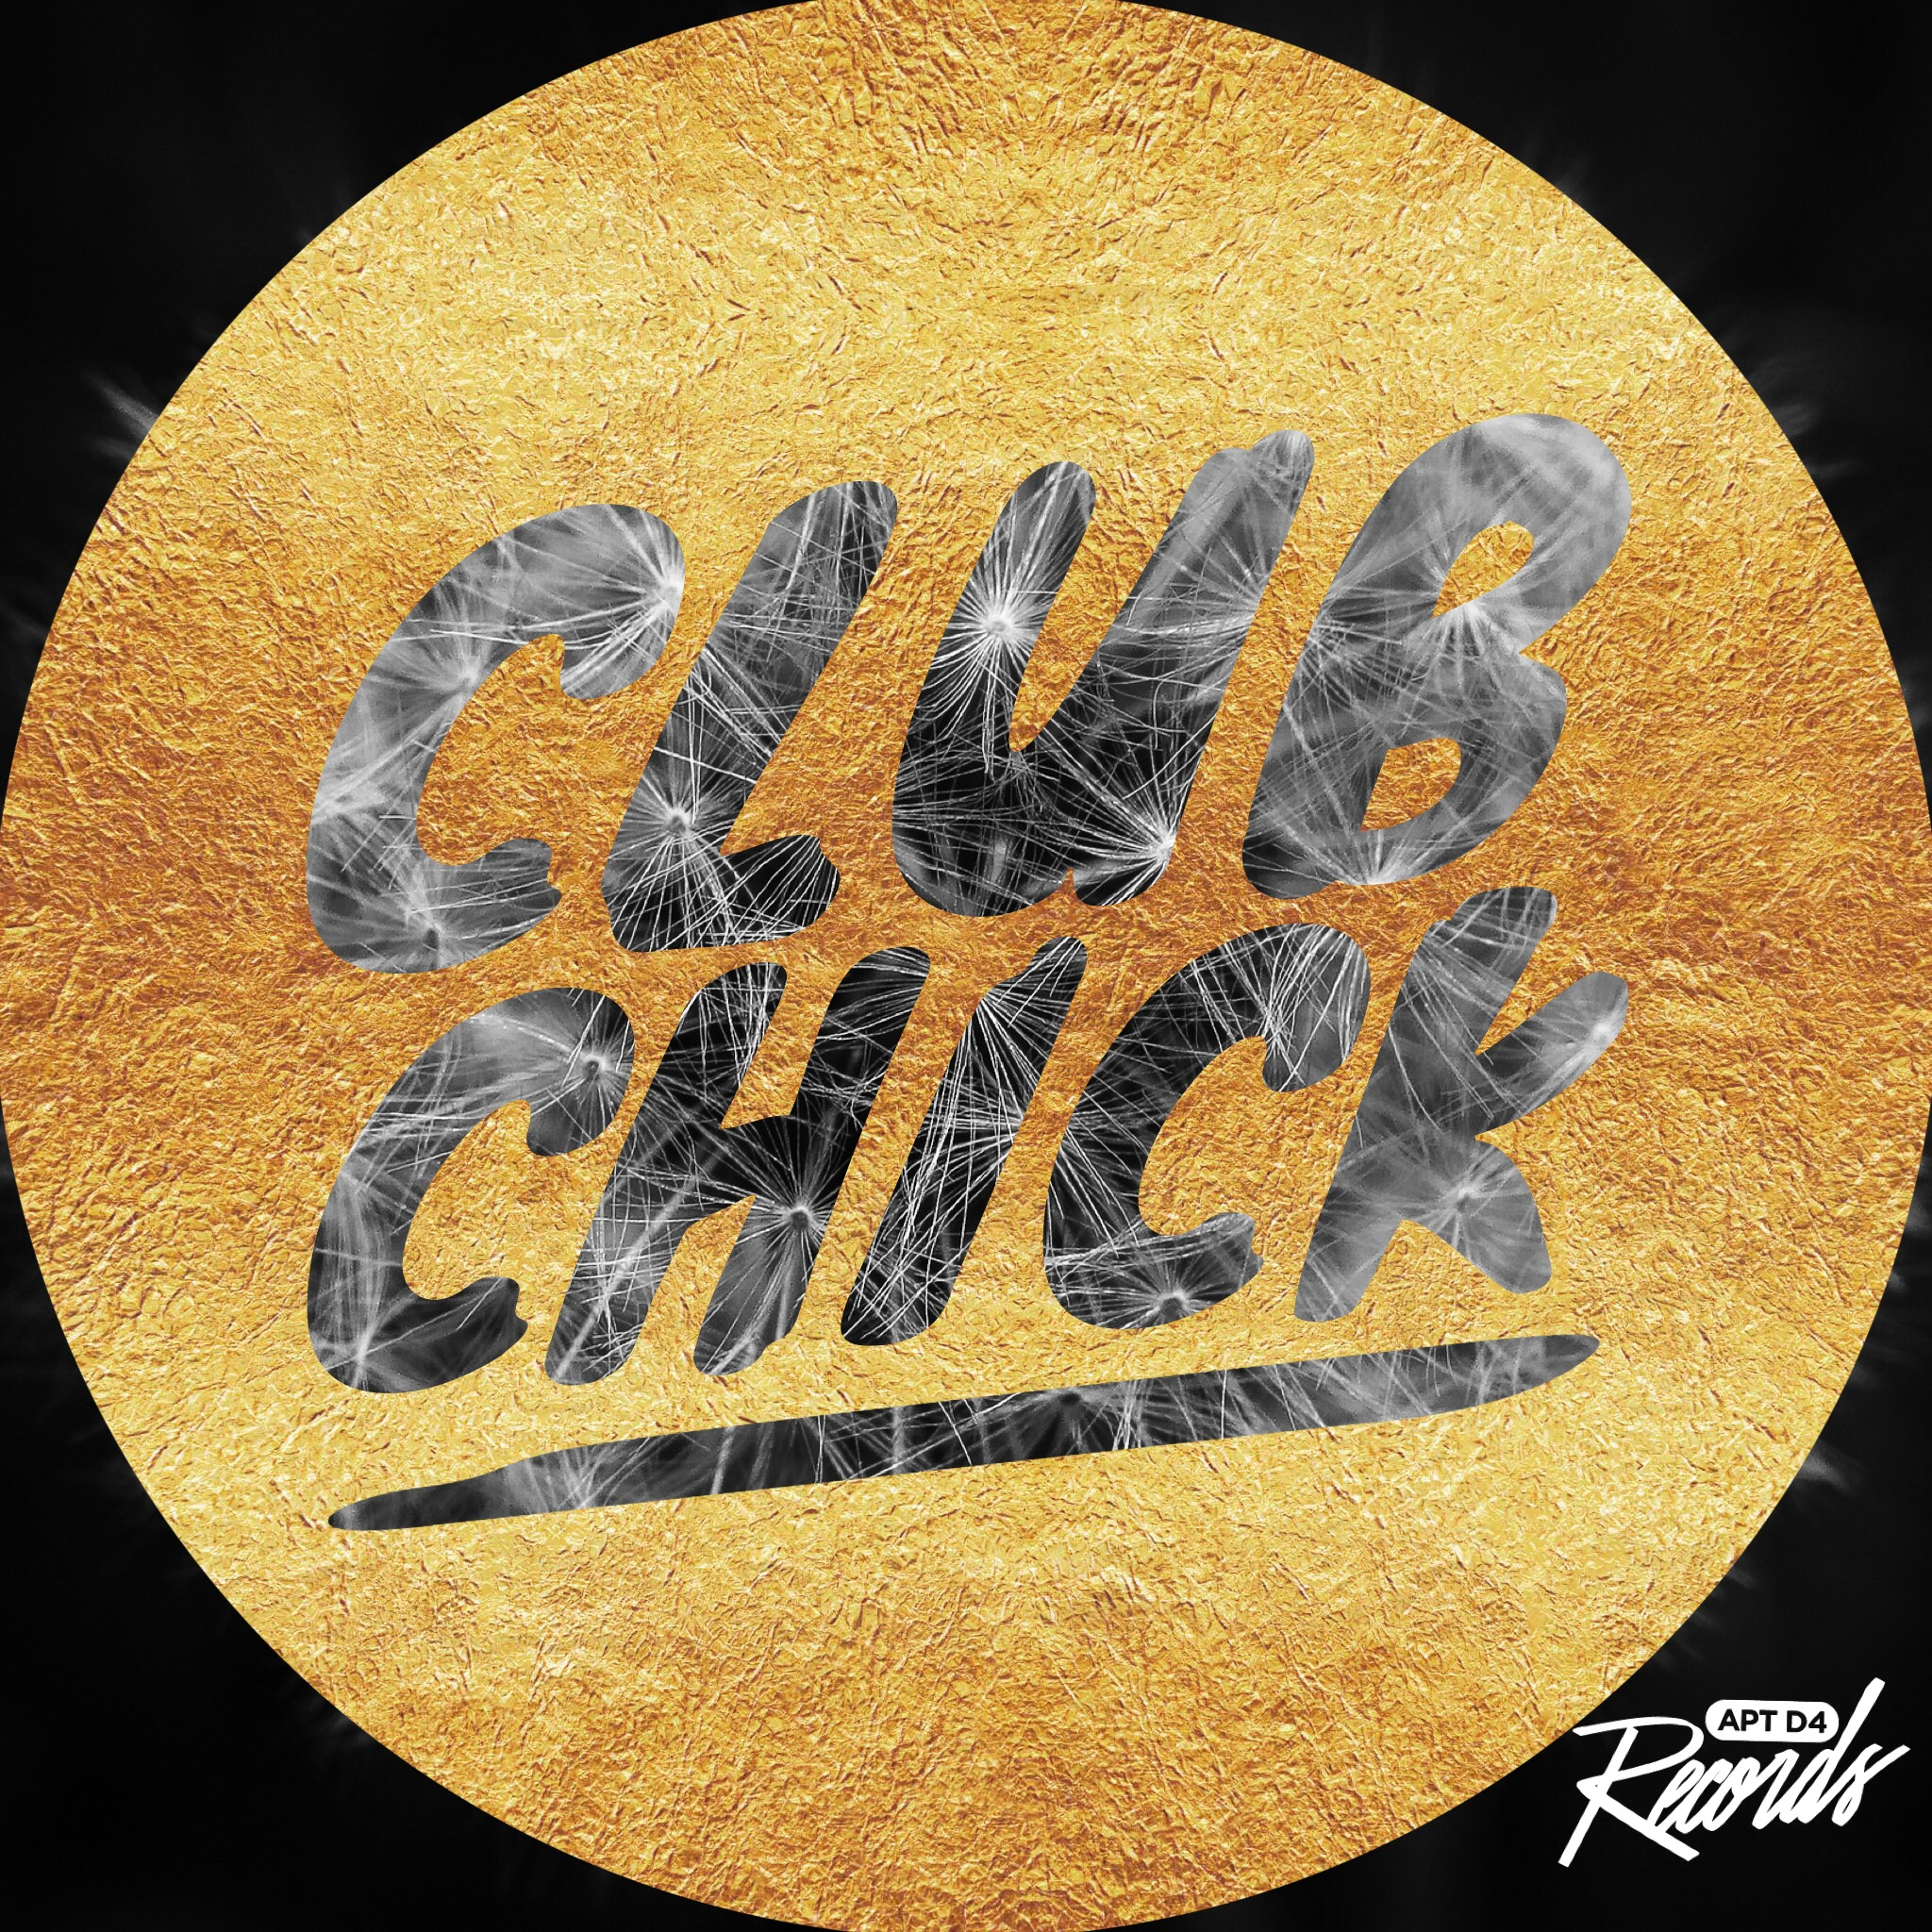 APT016 - Club Chick - Sept 29 1018